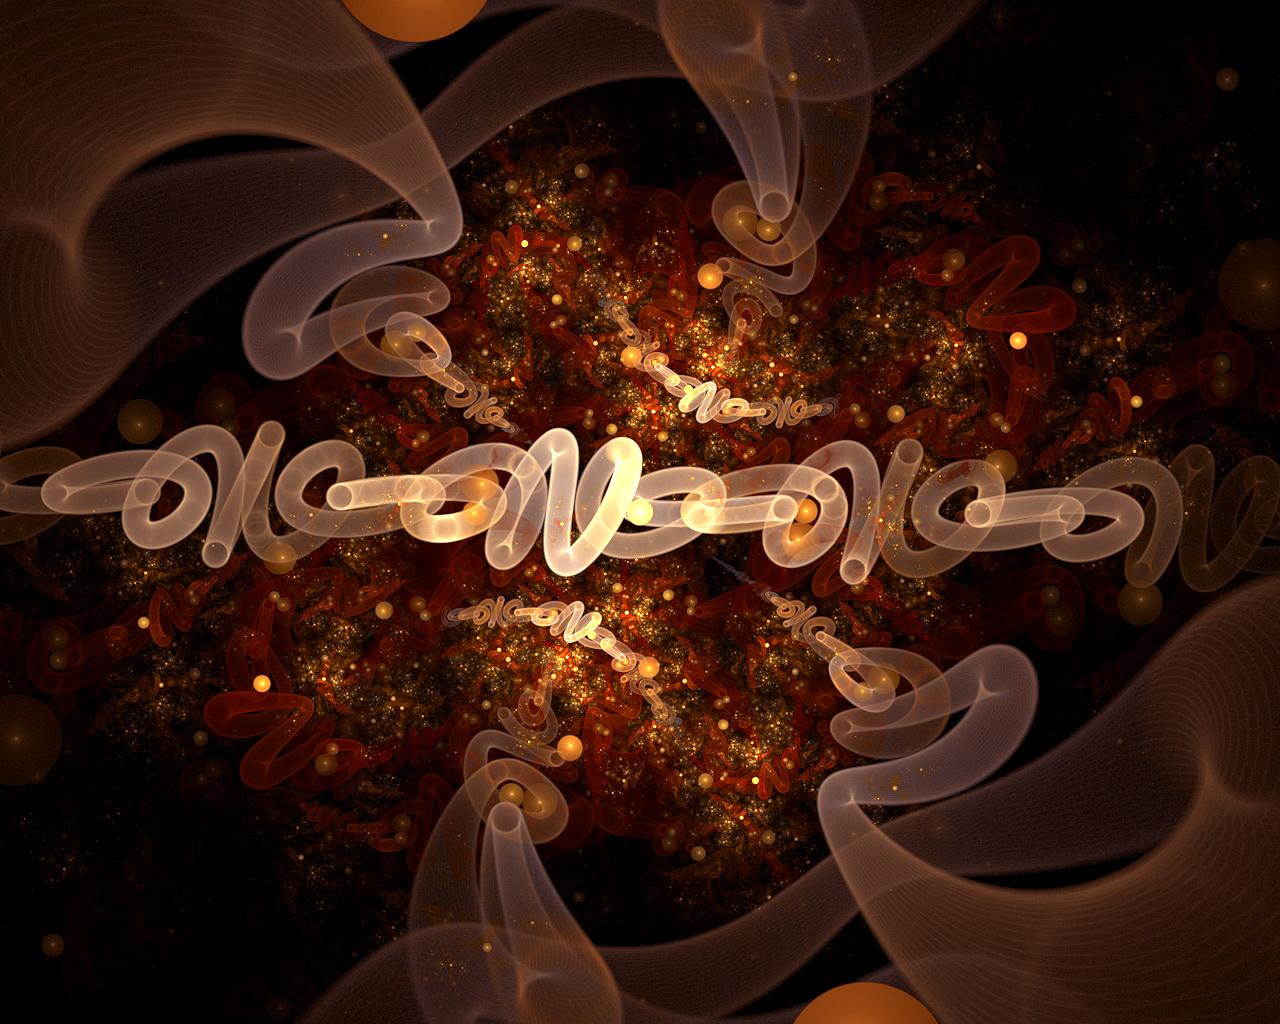 Signature by CygX1